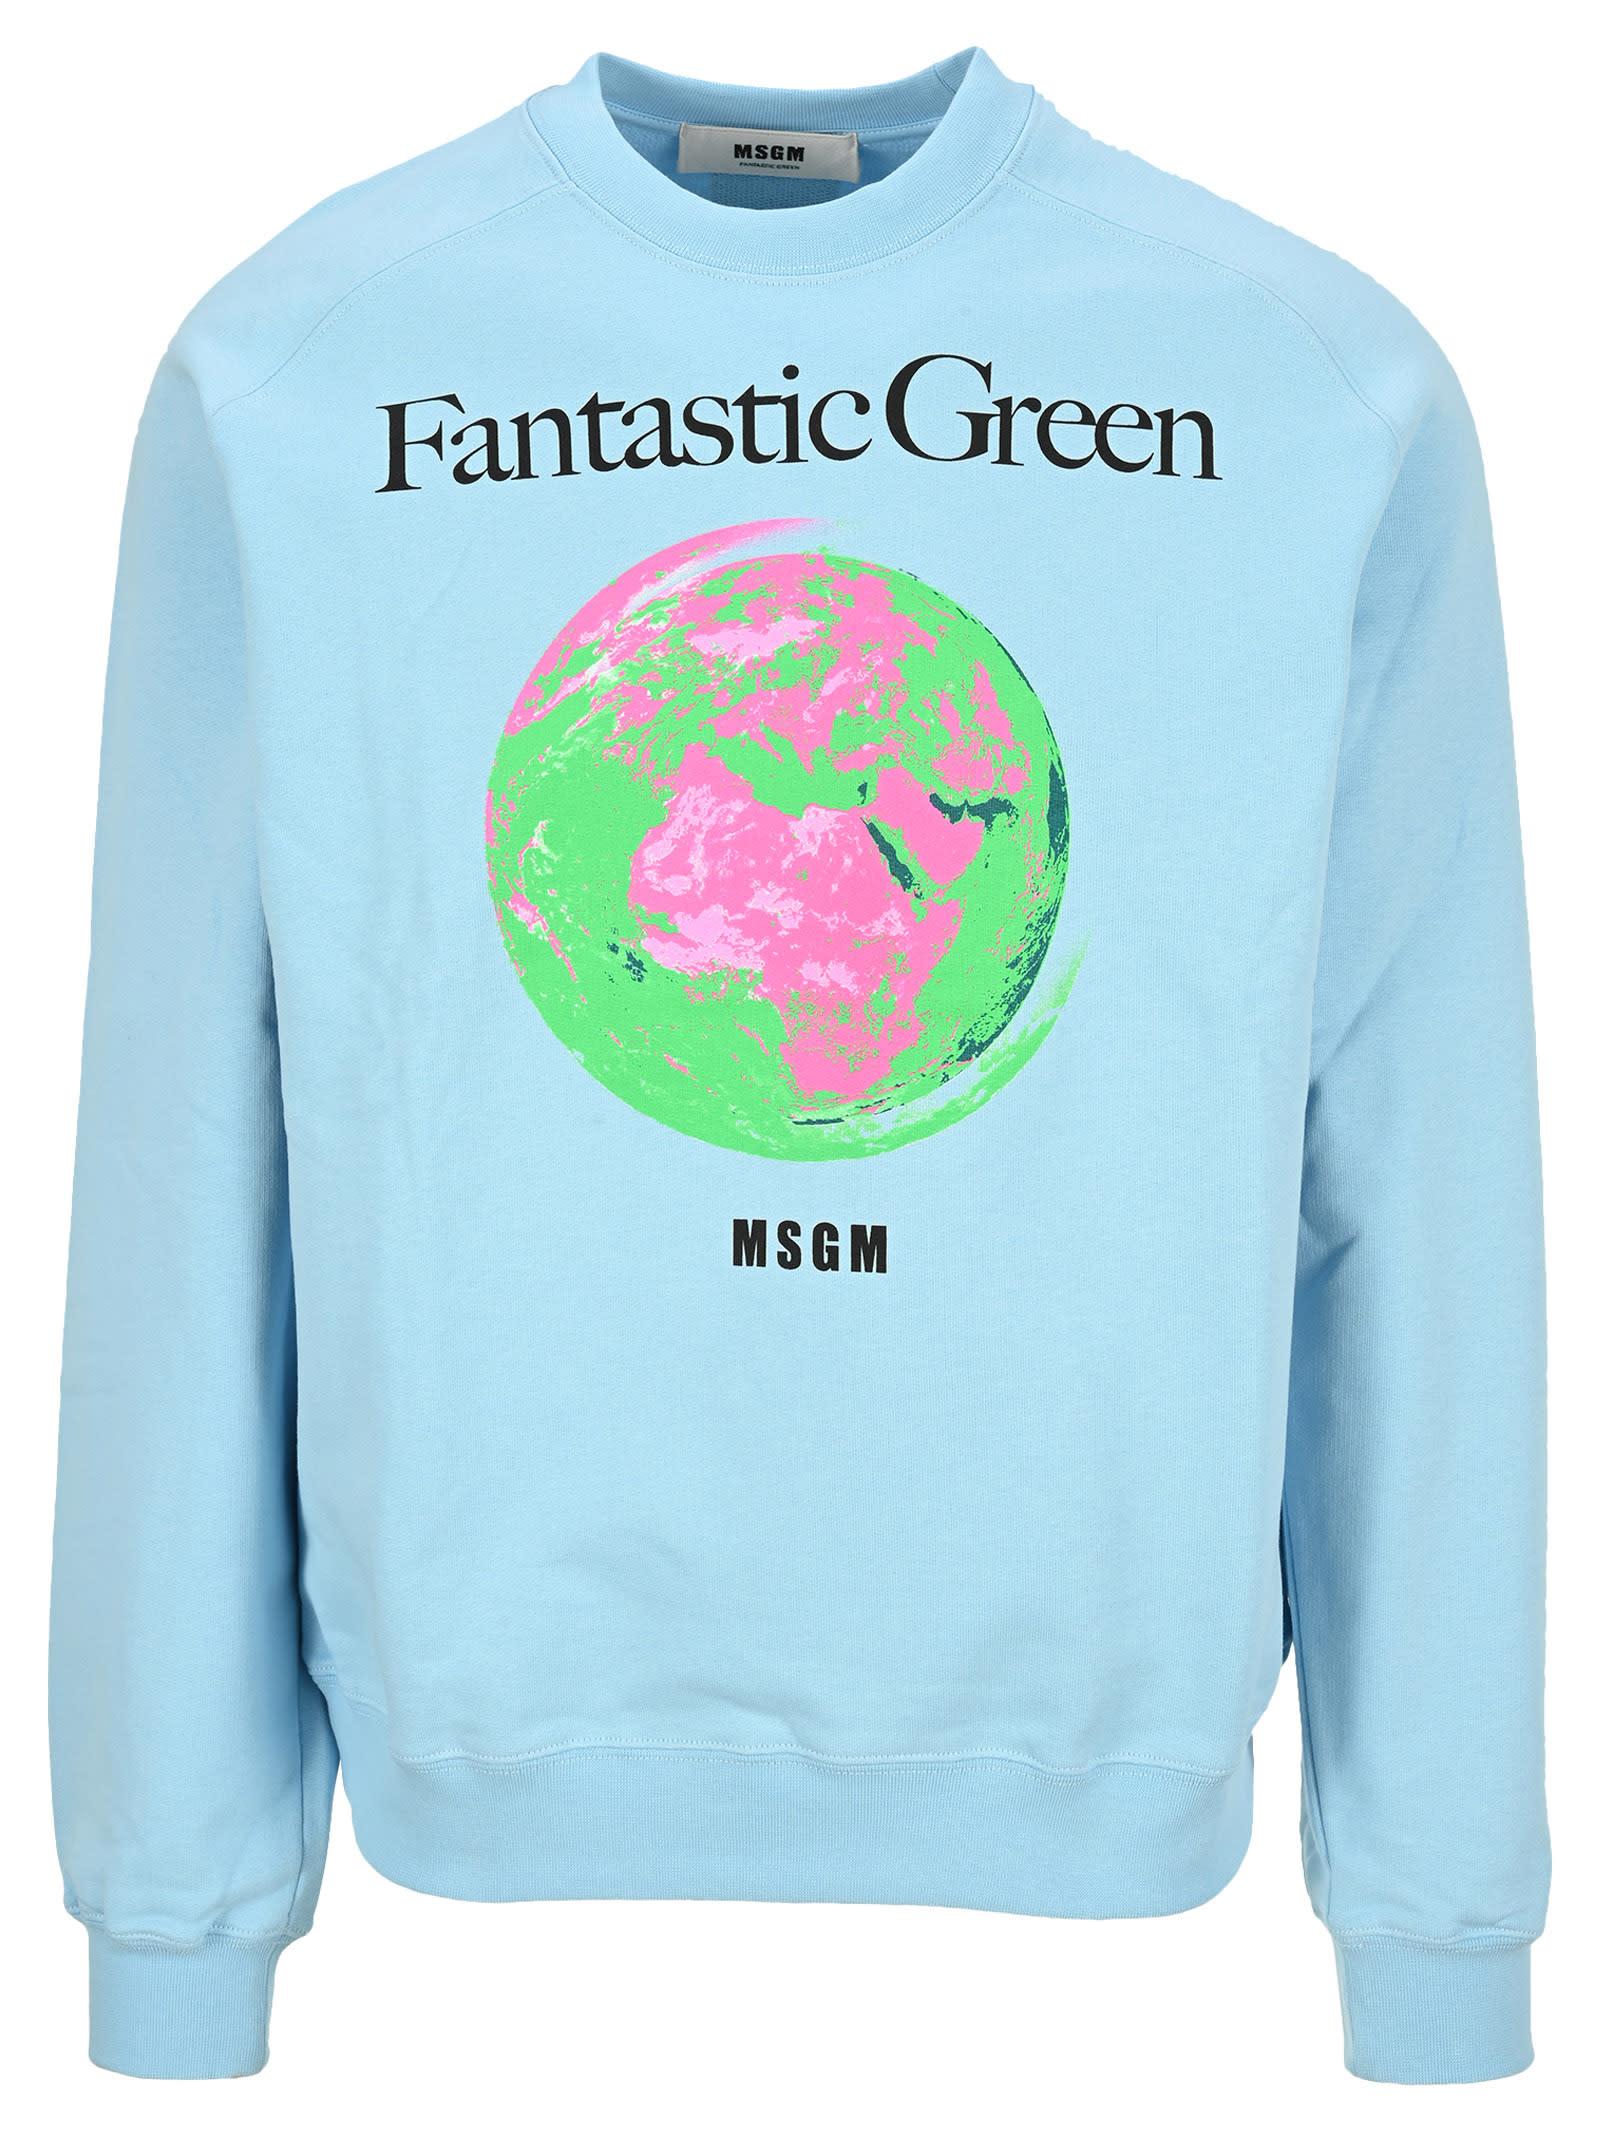 Msgm Sweatshirts MSGM FANTASTIC GREEN SWEATSHIRT